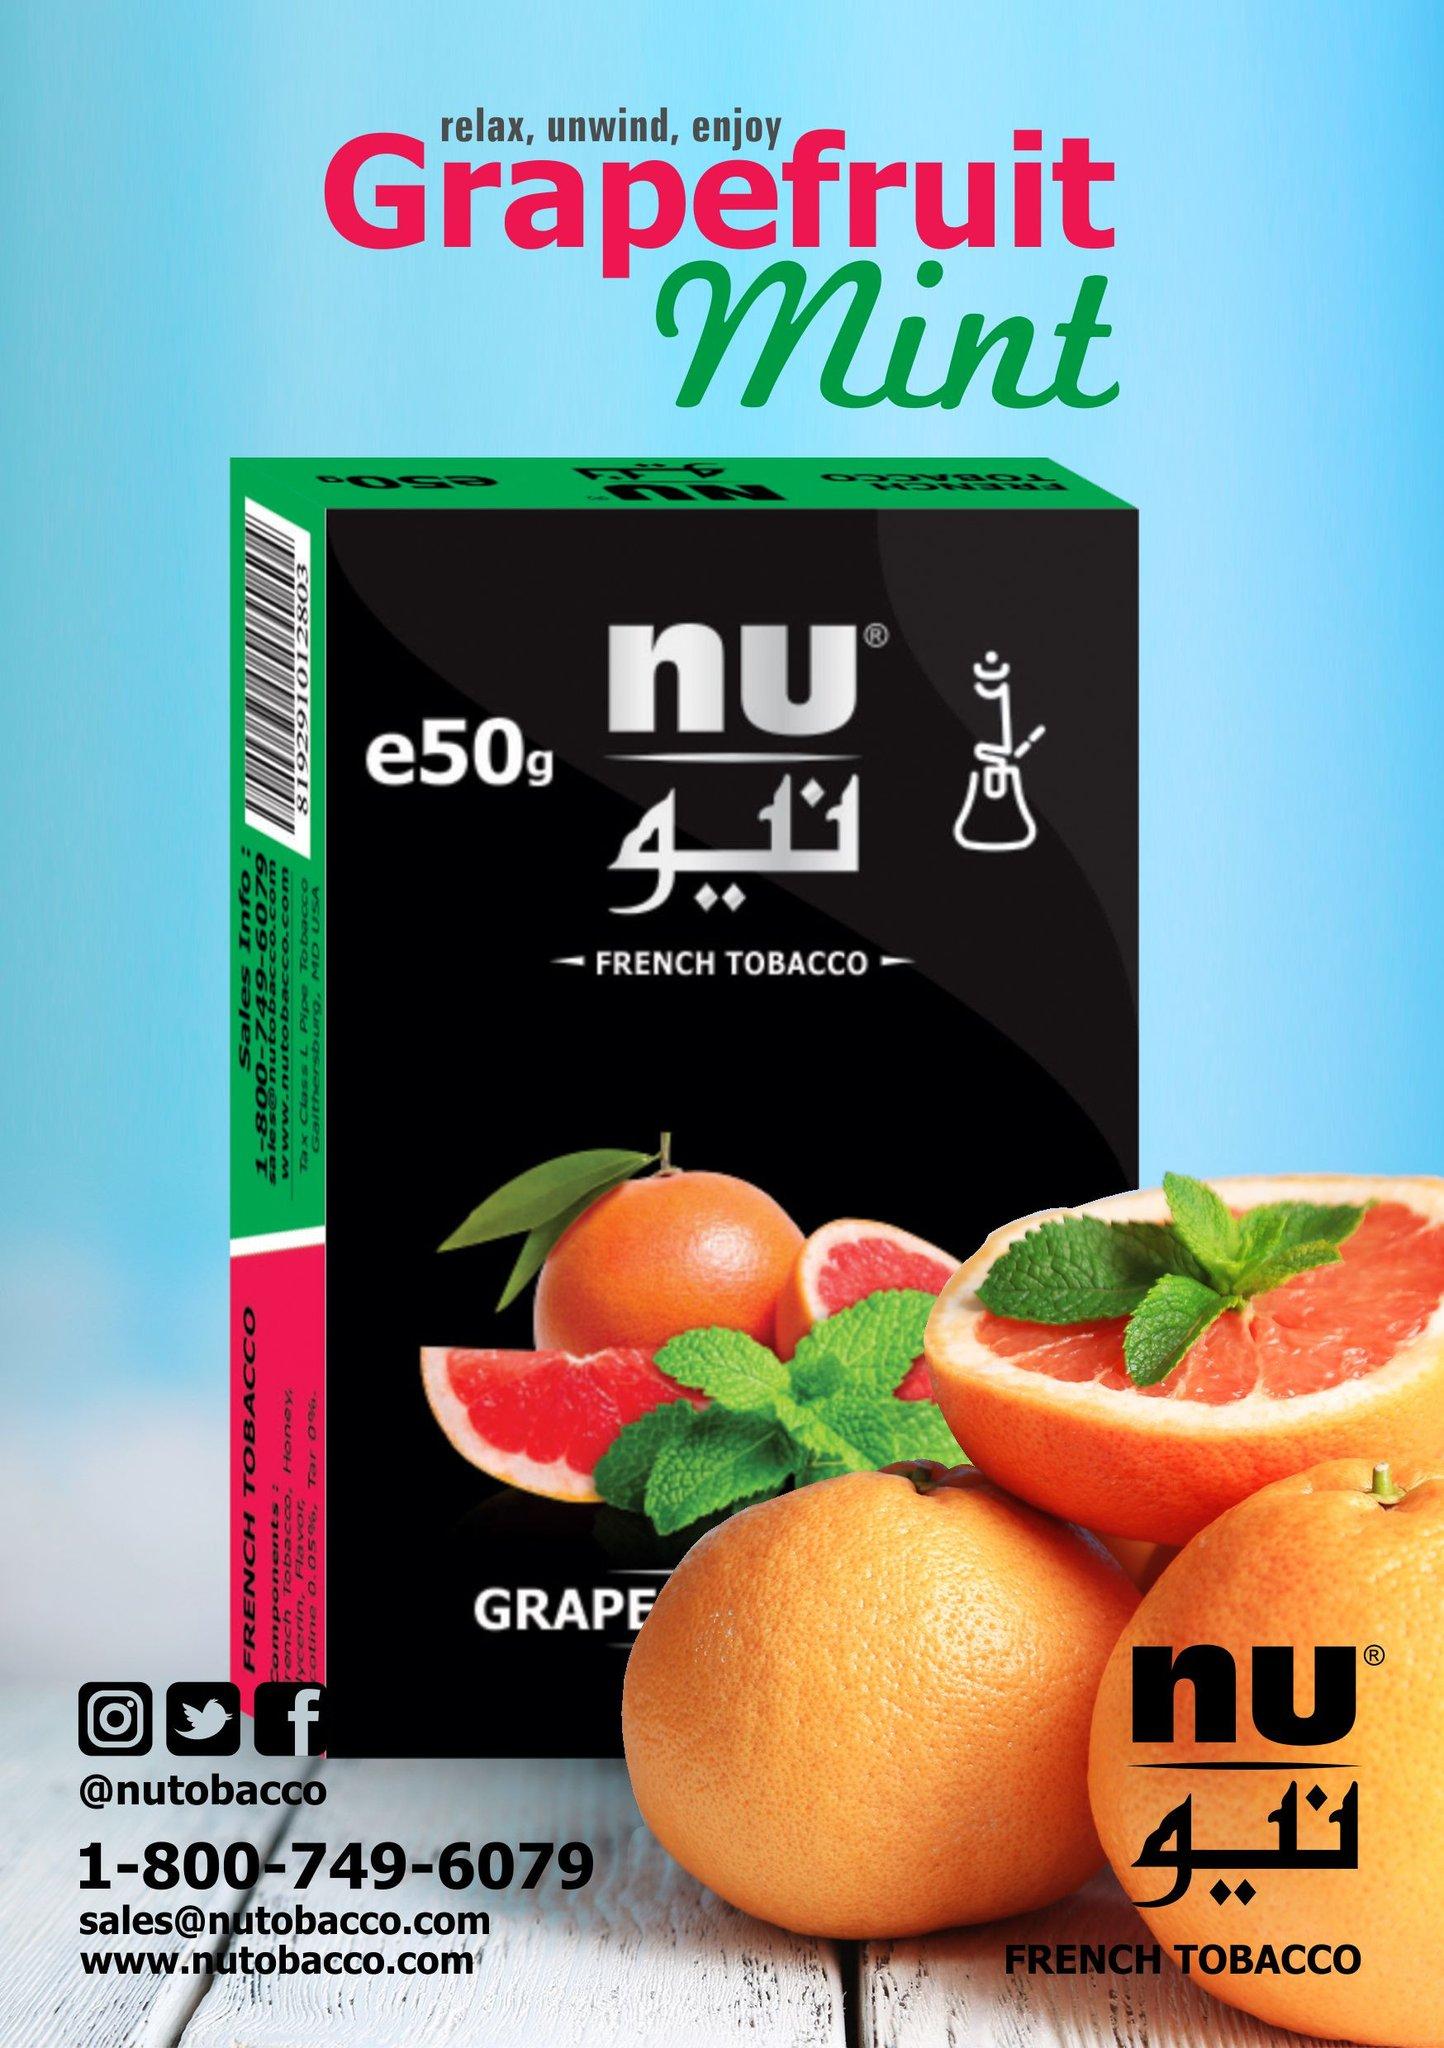 Nu Hookah / Grapefruit Mint(スッキリした酸味の強いGrapefruit系と、そこそこの清涼感)